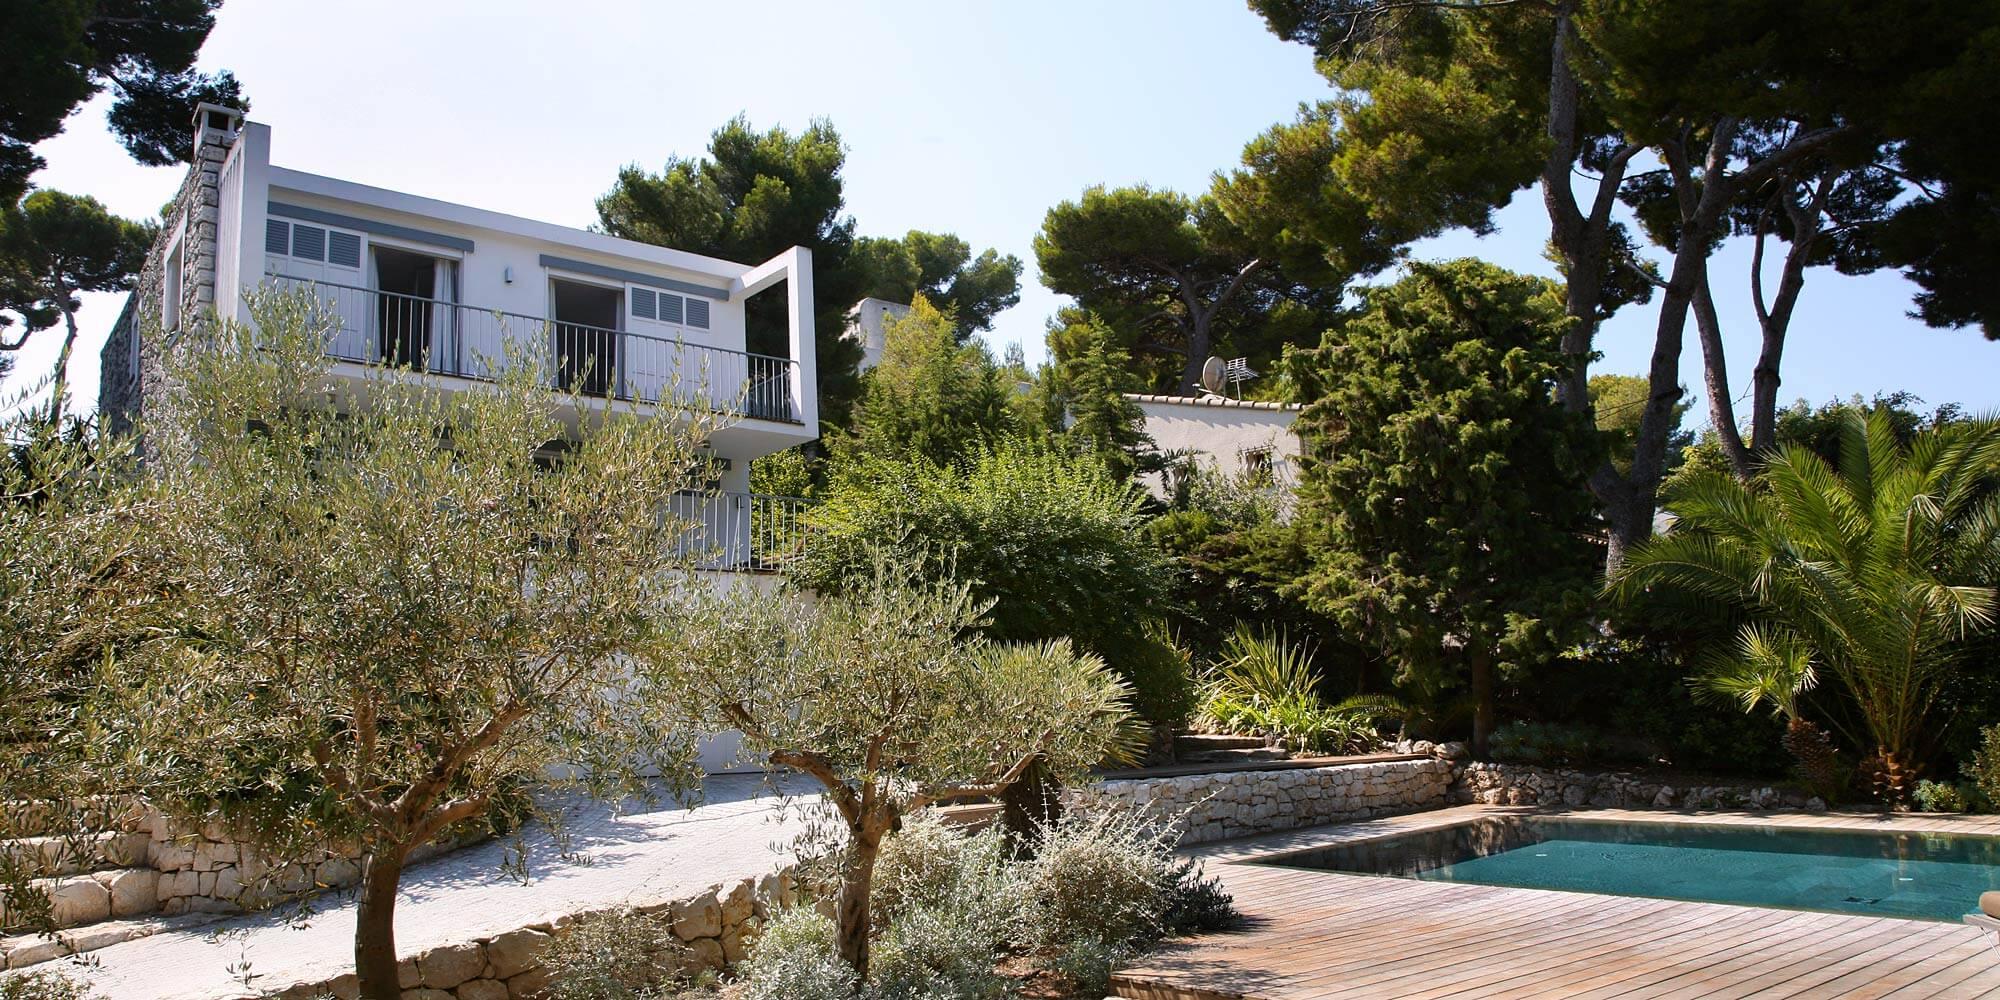 La Maison Moderne, Cap d\'Antibes, southern France Hotel Reviews